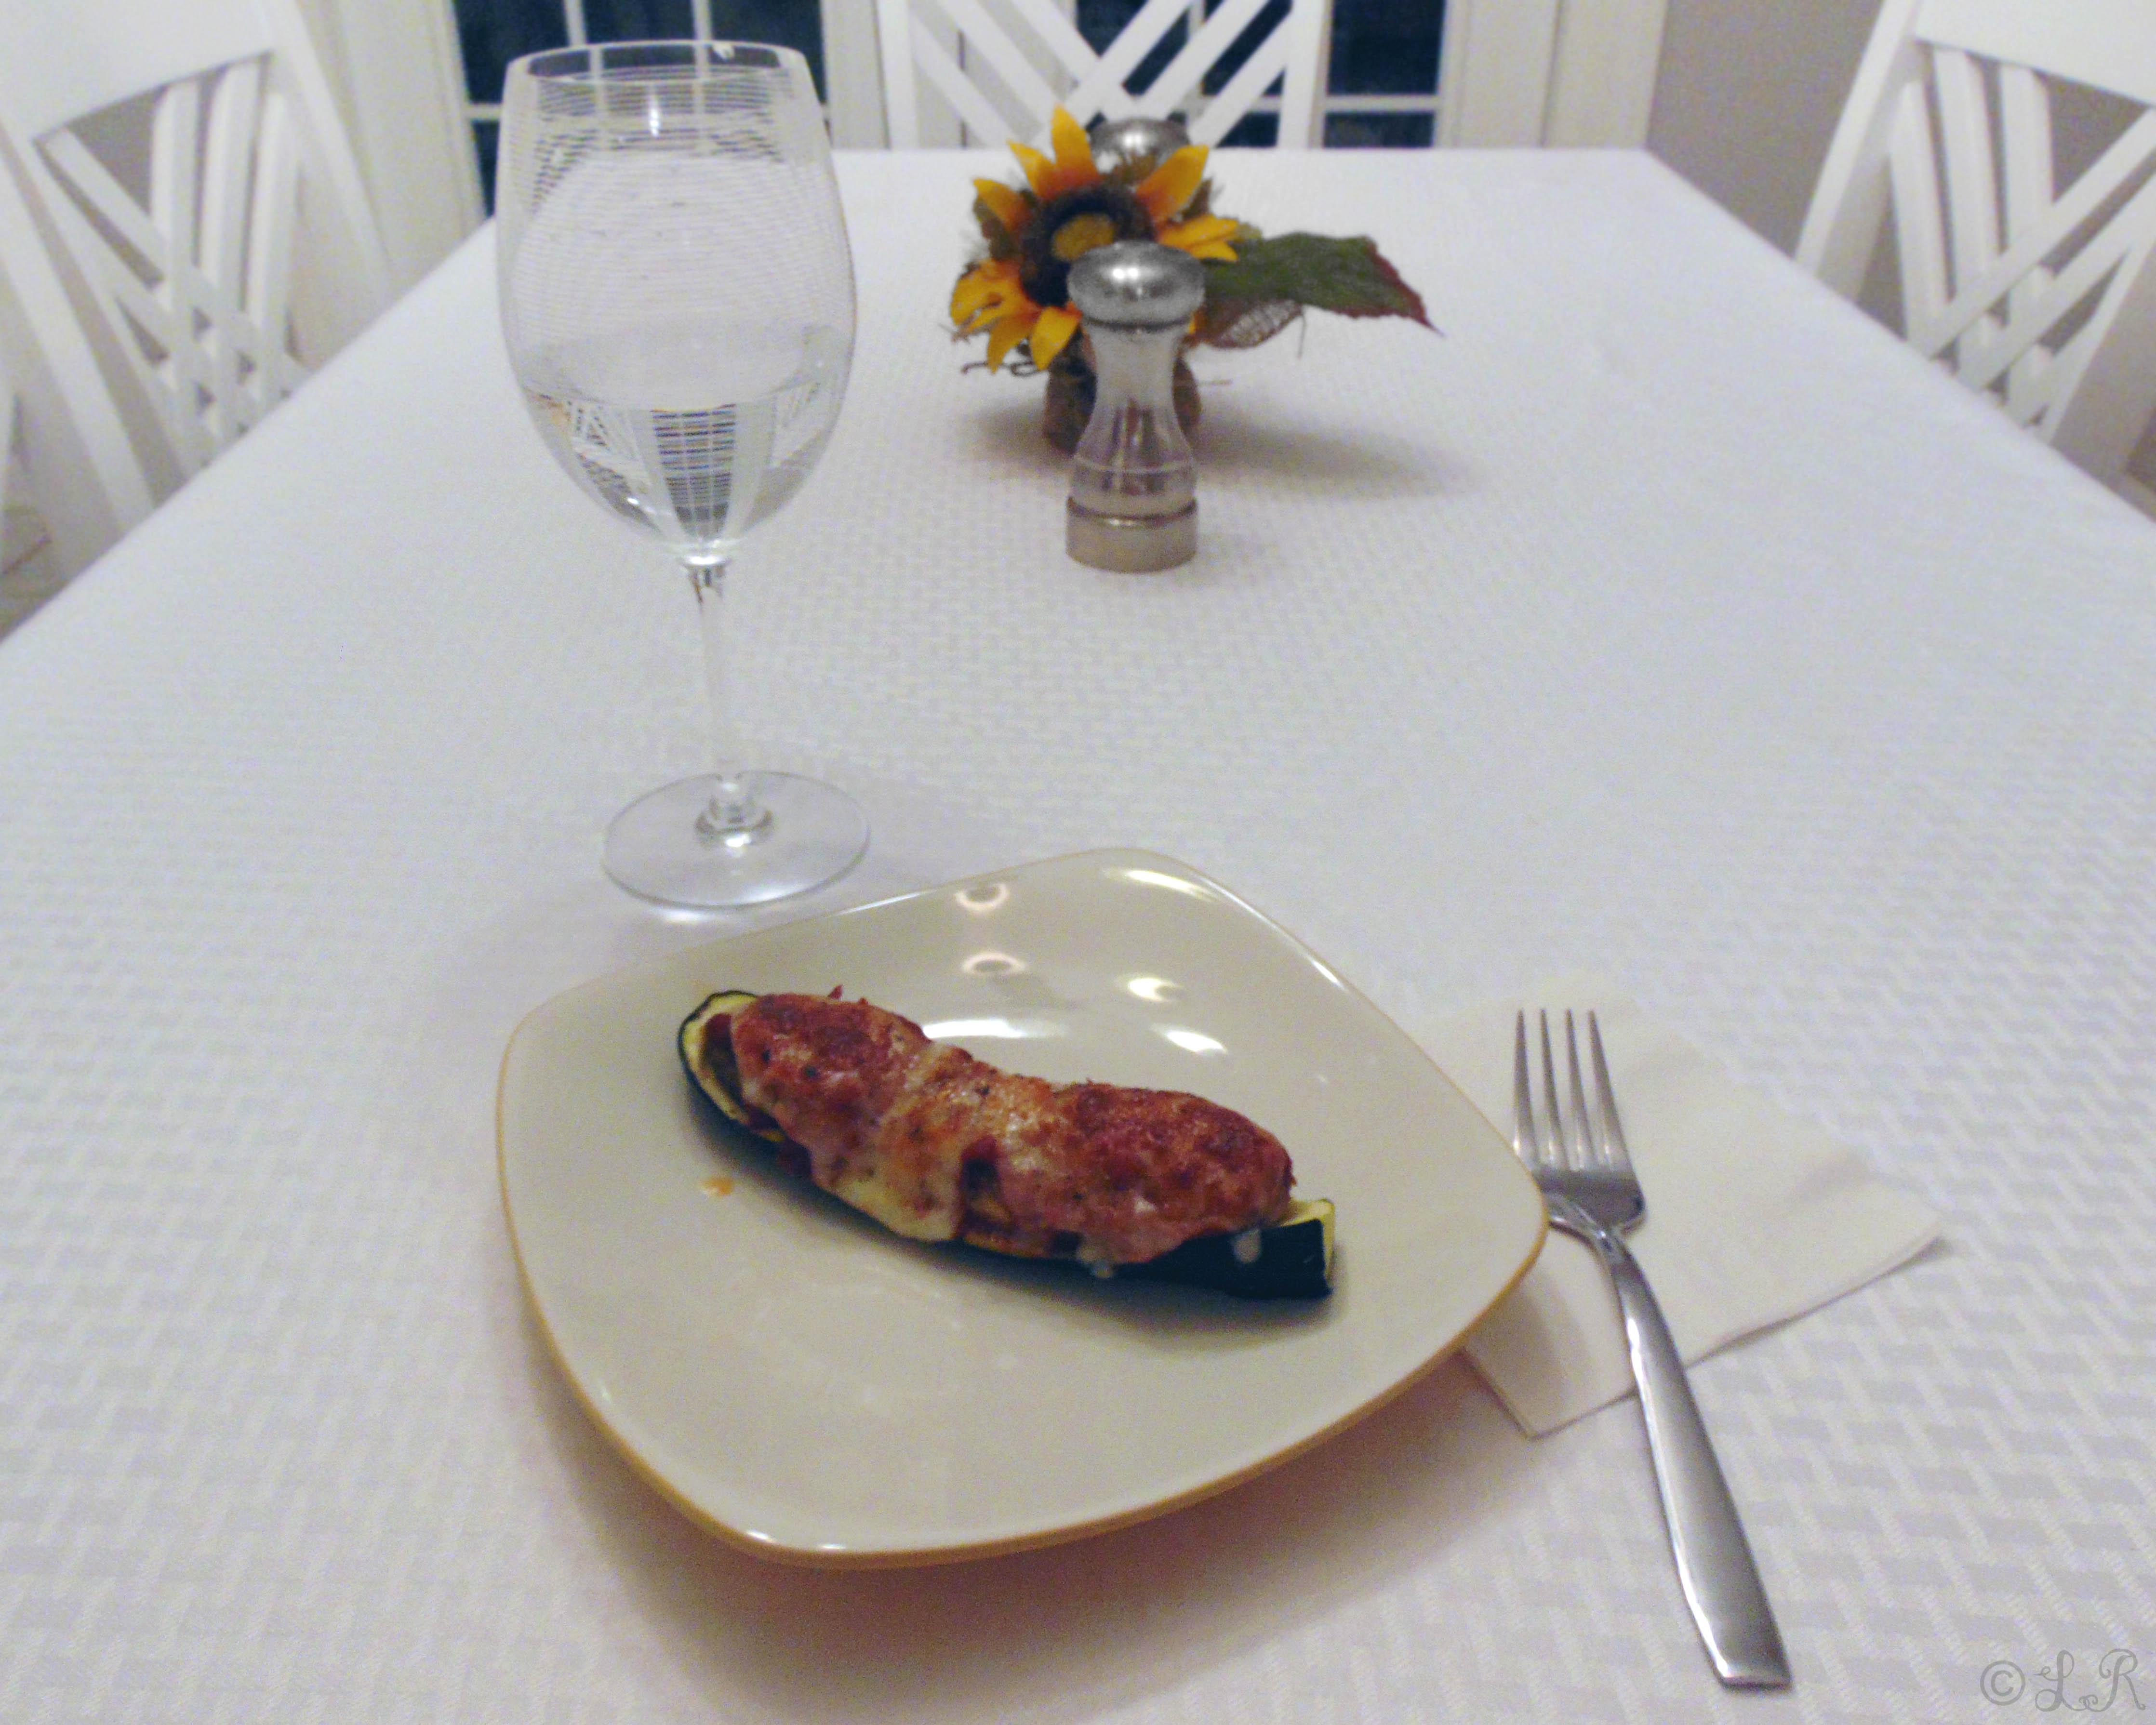 zucchini healthy meatball italian dish easy paleo gluten free whole 30 low carb